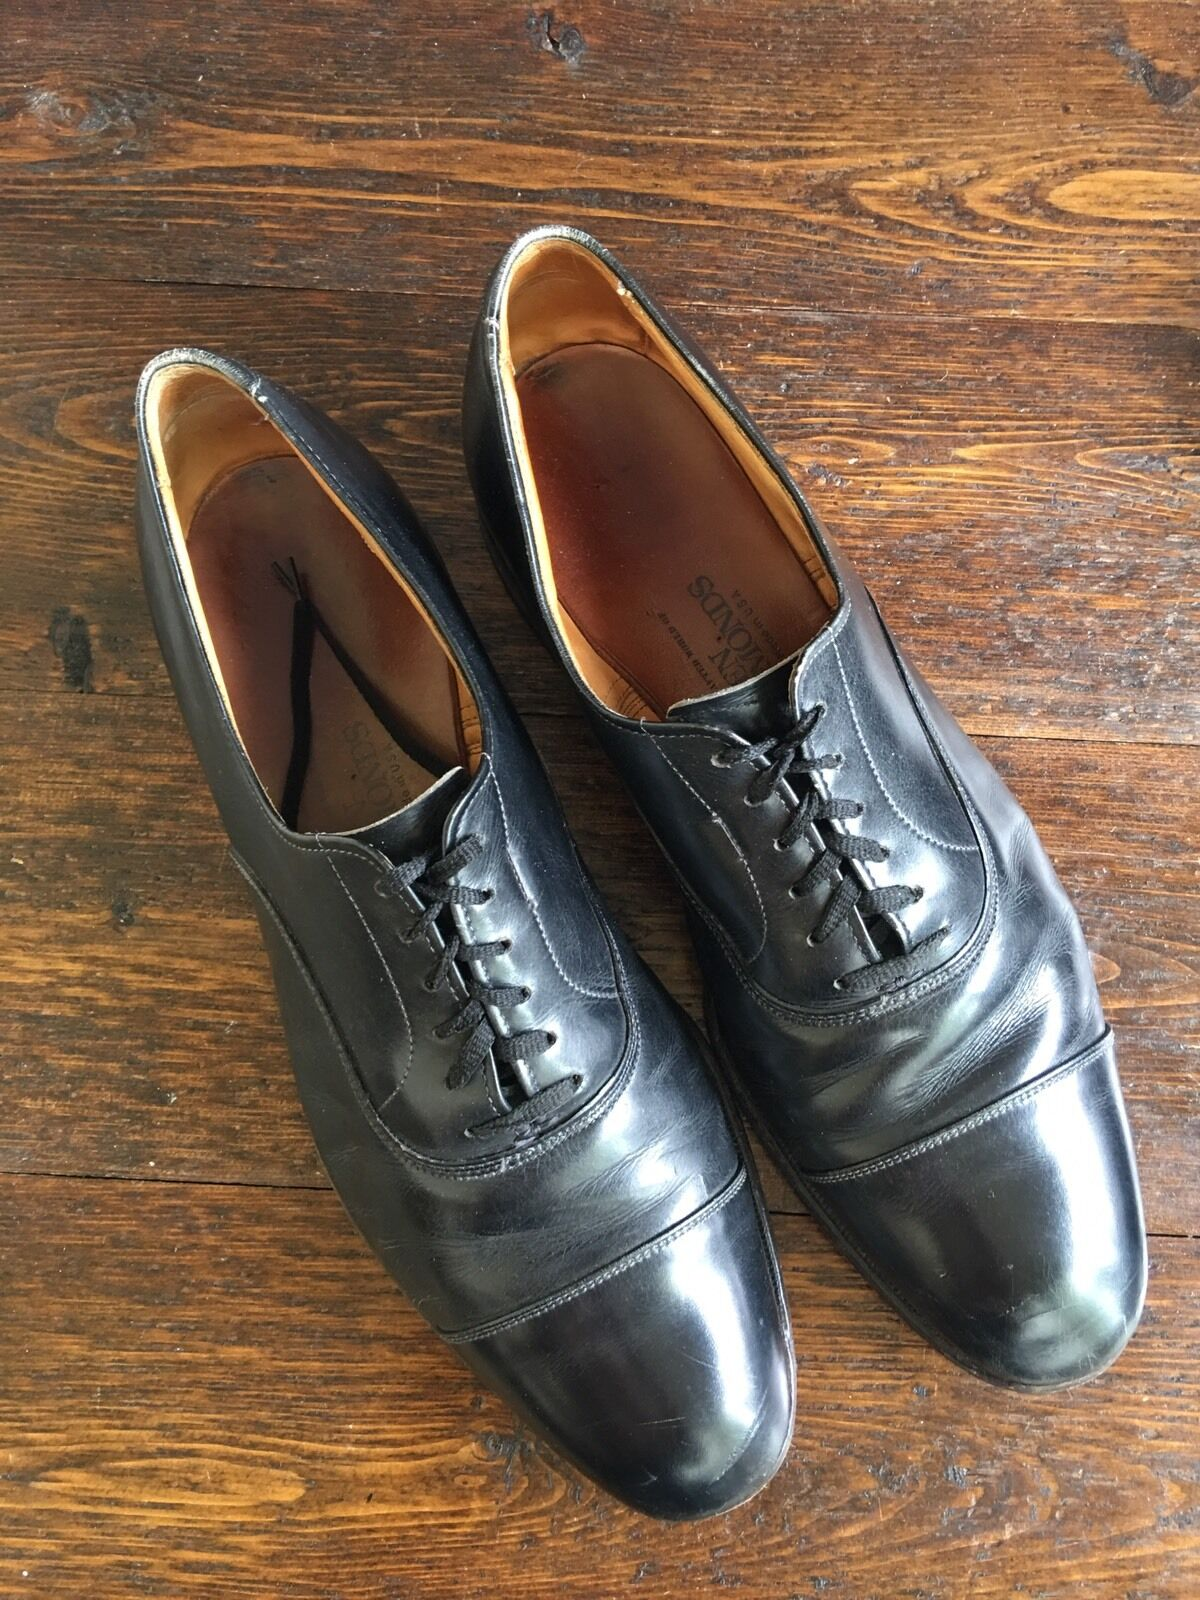 Men's Allen Edmonds Park Avenue Dress Oxfords Calfskin 11 B Cap Toe Calfskin Oxfords Leather 96b33f